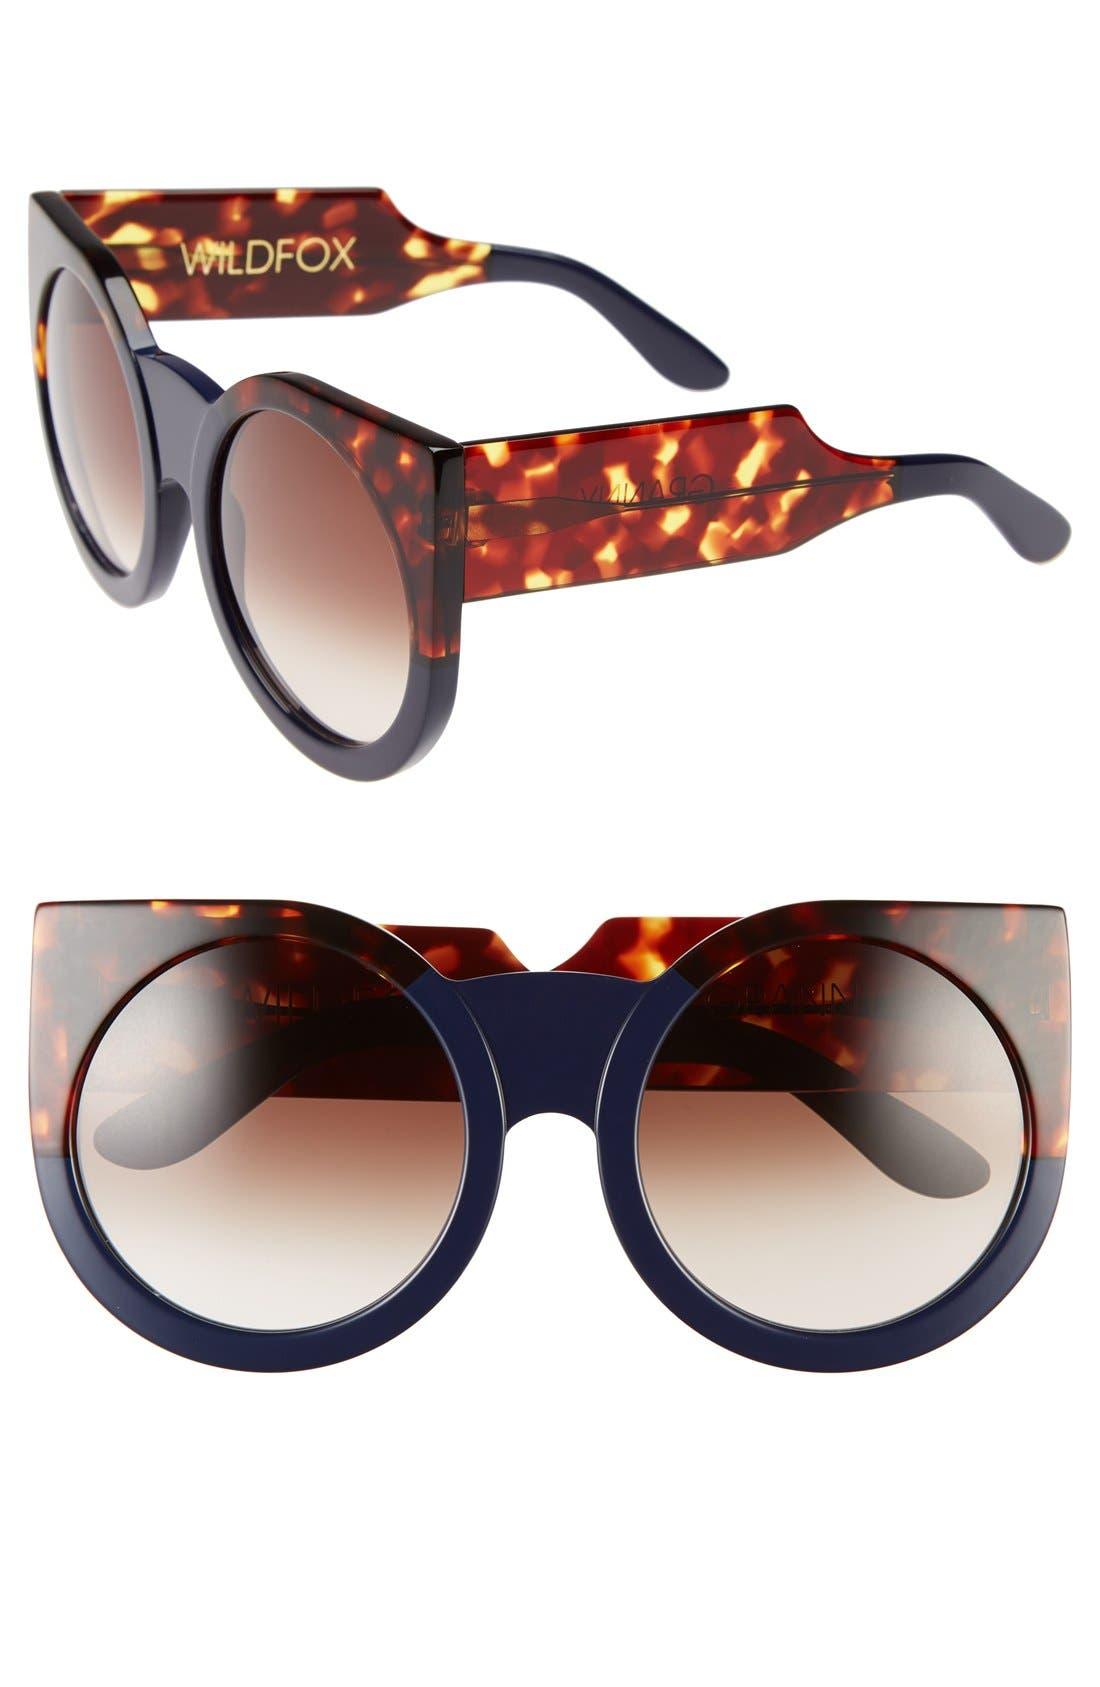 Main Image - Wildfox 'Granny' Sunglasses